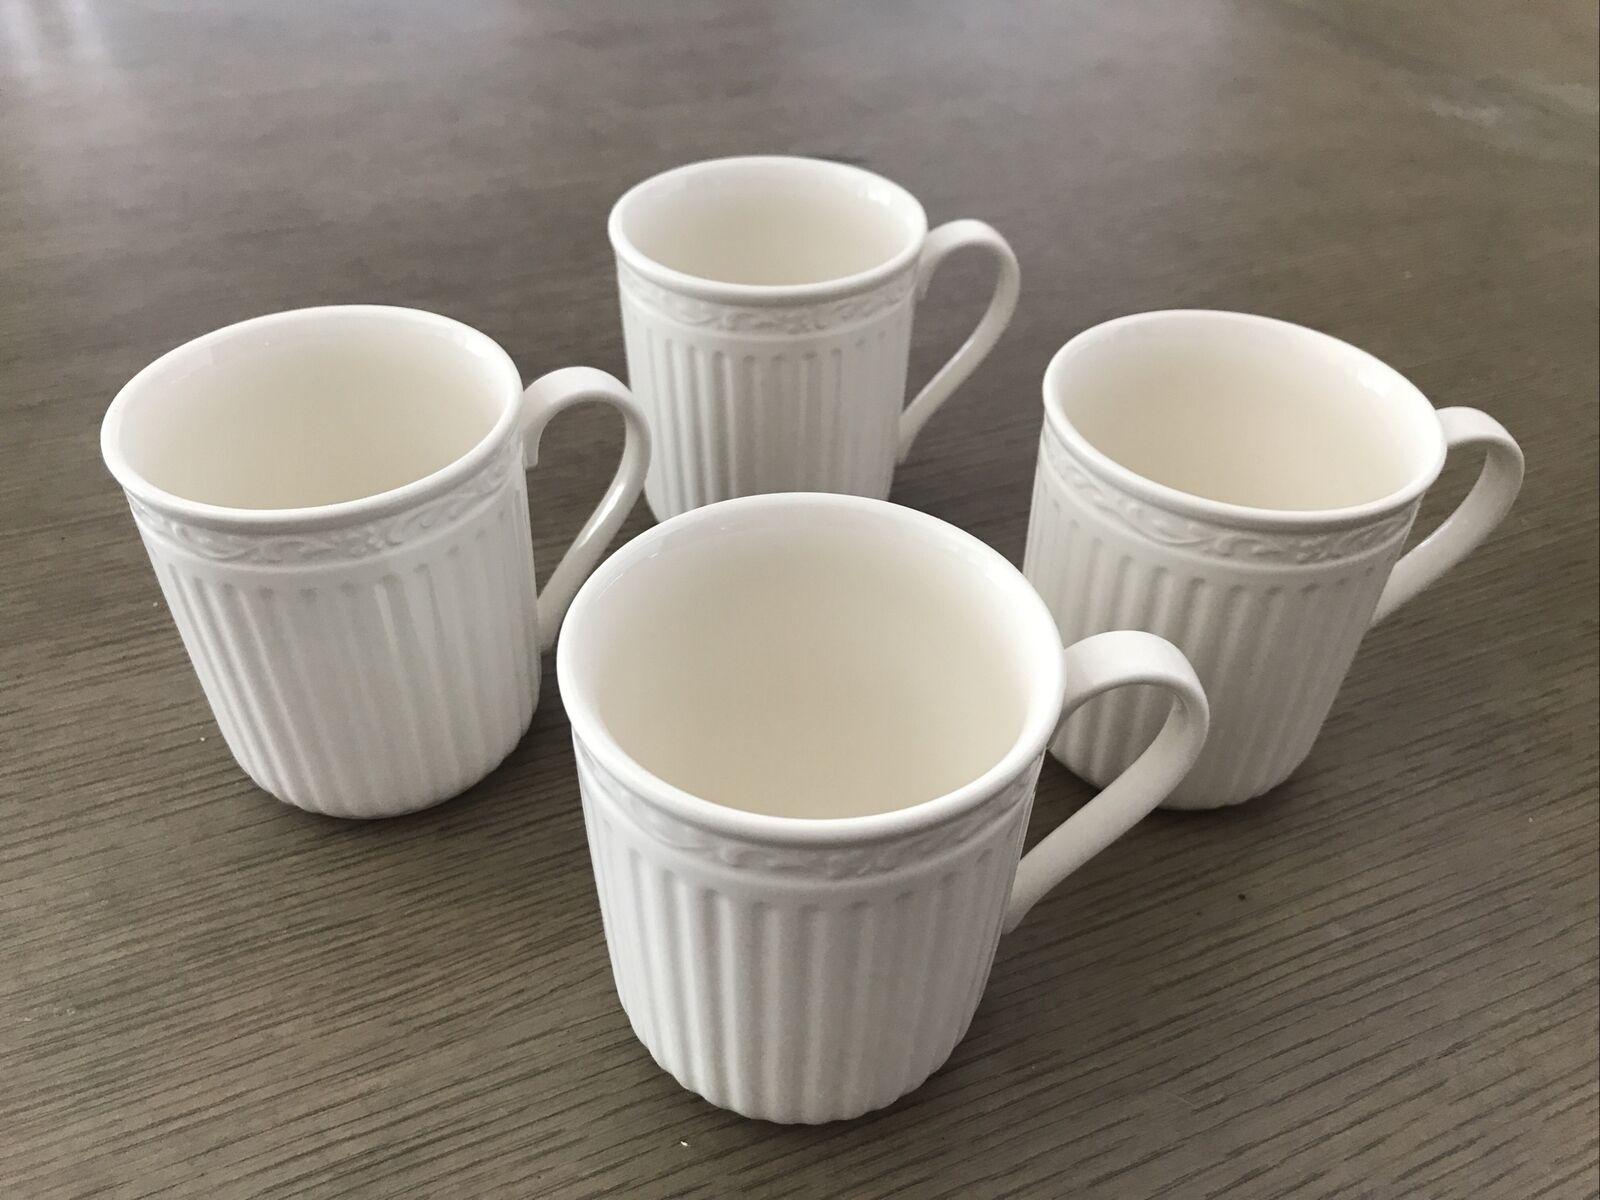 Set Of 4 Mikasa Italian Countryside Coffee Cups Mugs DD900 GUC 10oz - $29.99